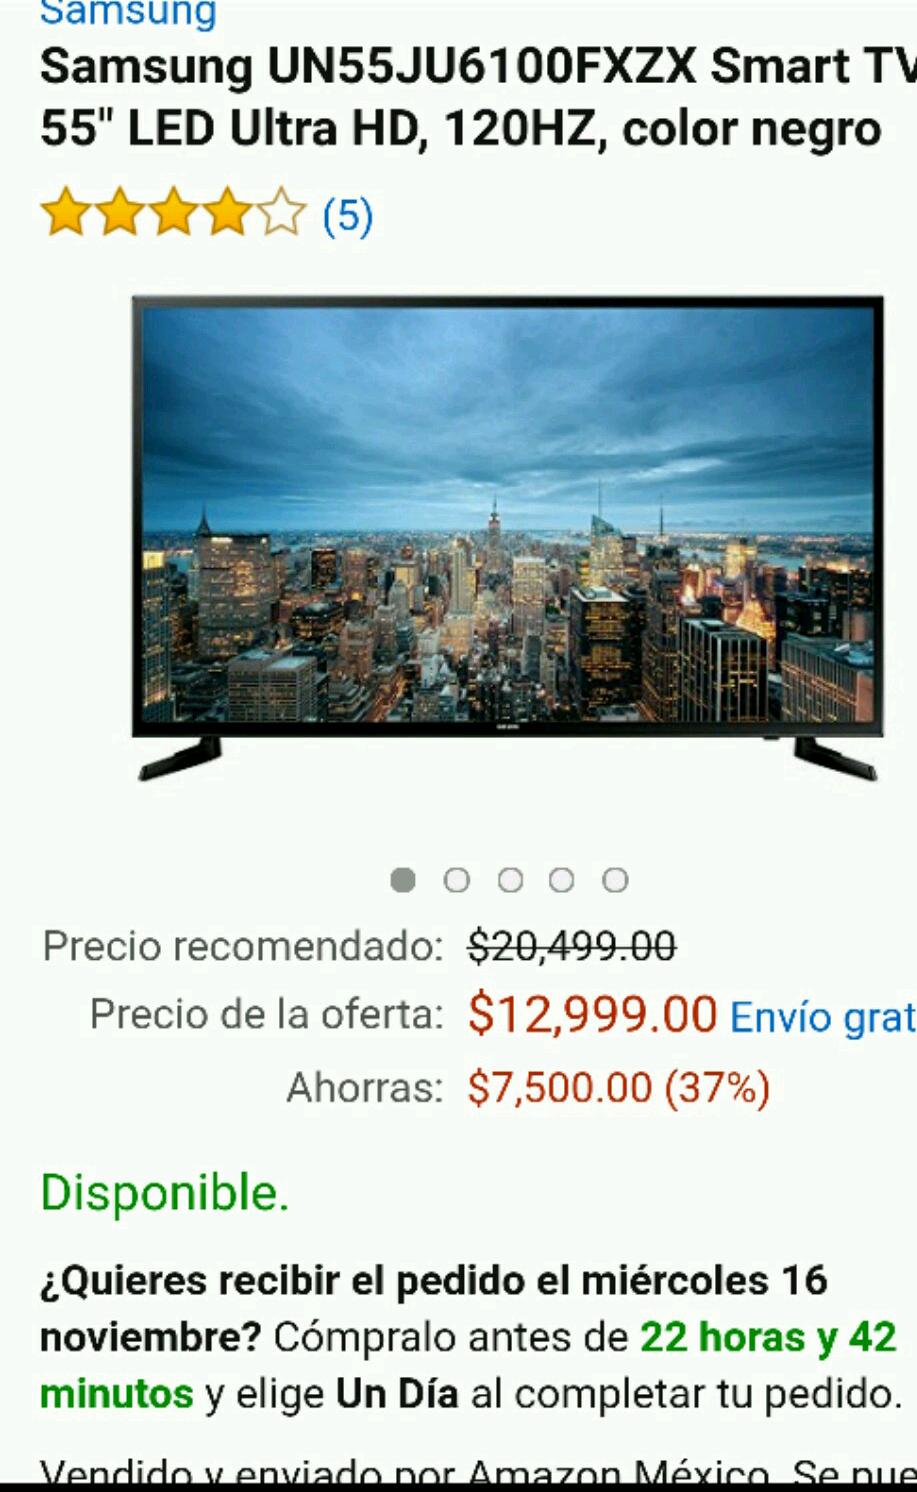 "Amazon: Samsung UN55JU6100FXZX Smart TV 55"" LED Ultra HD, 120HZ,"